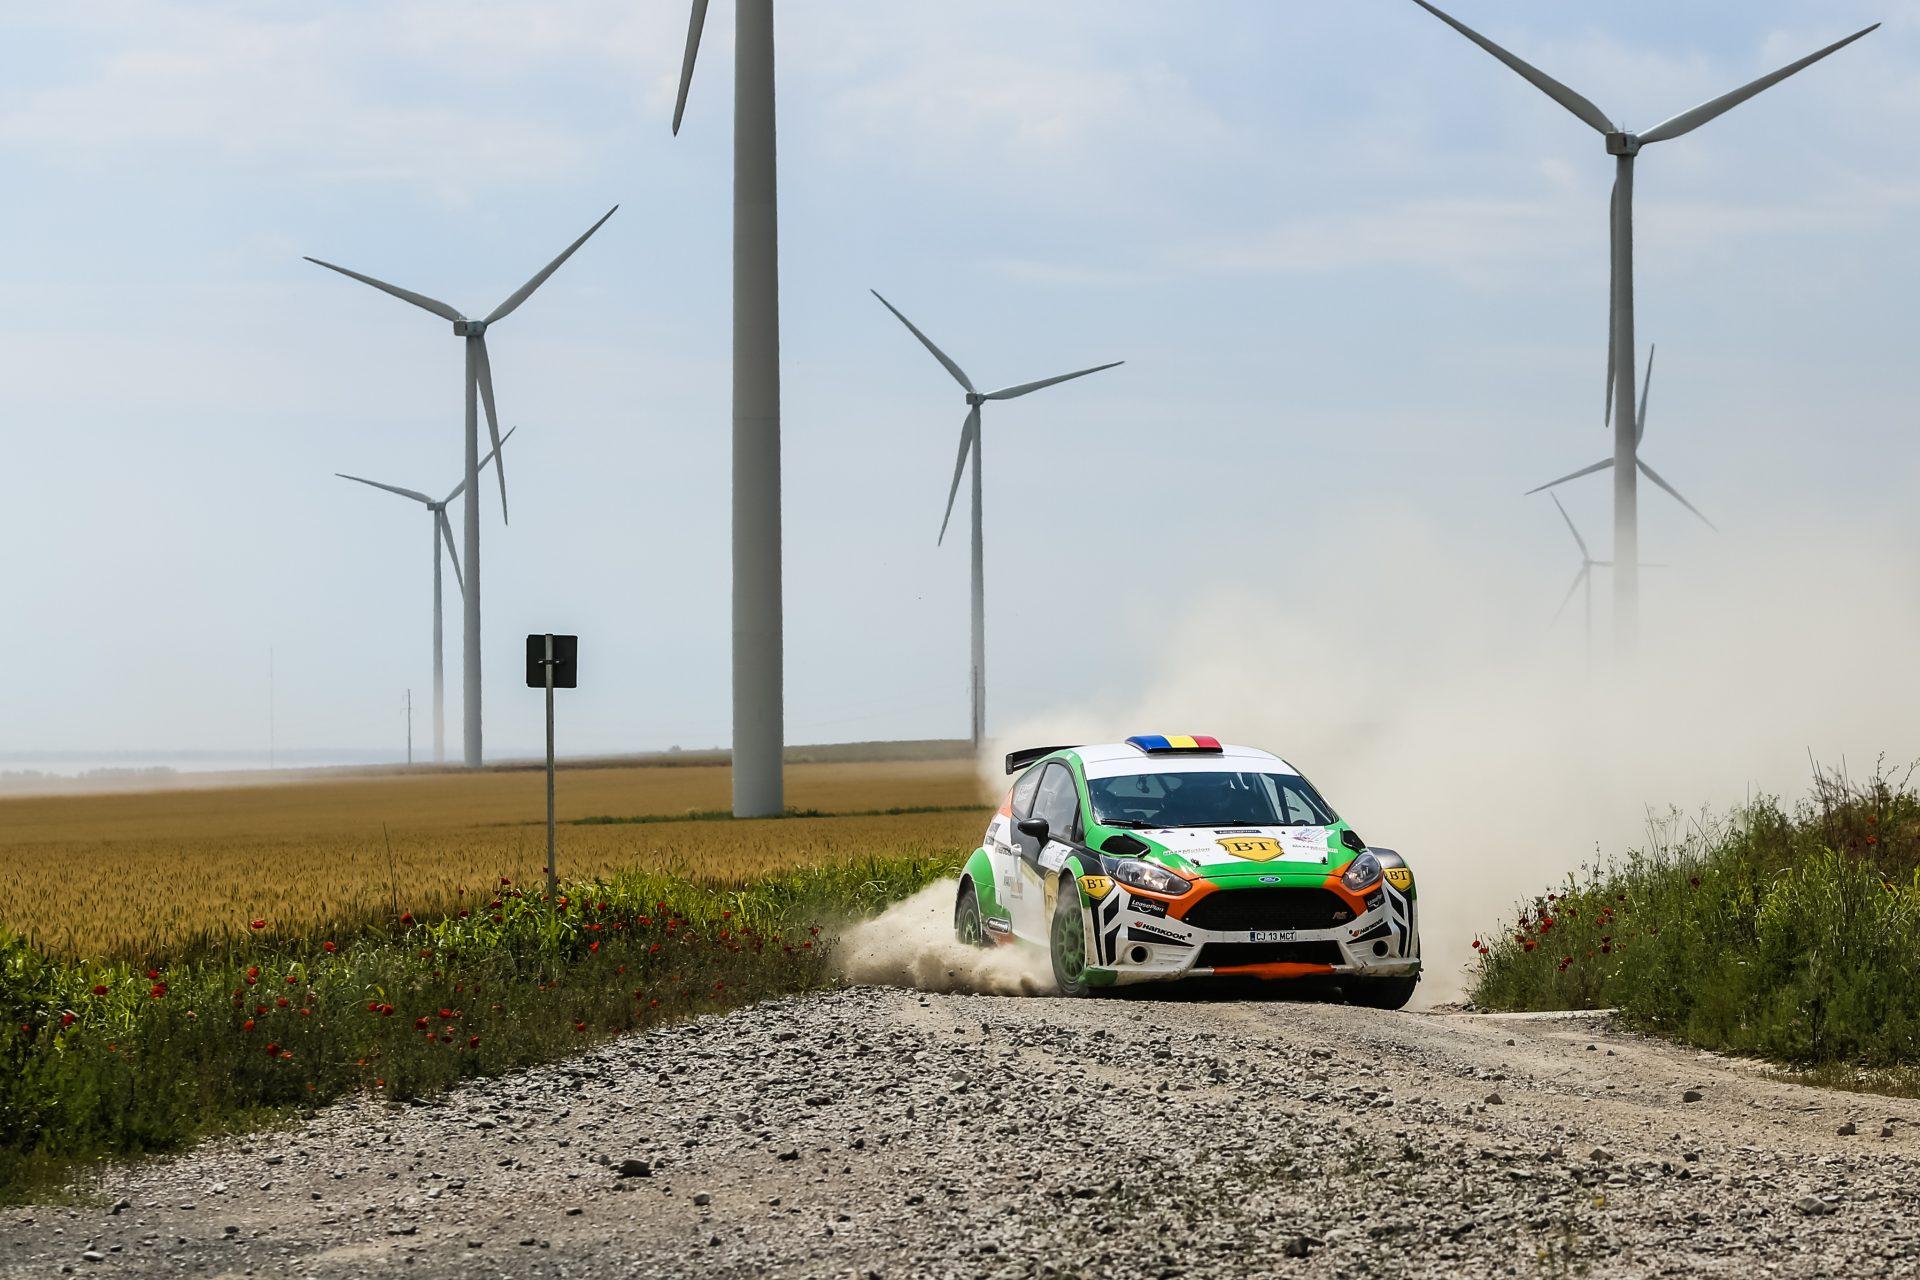 Best of Delta Rally 2016 by Attila Szabo